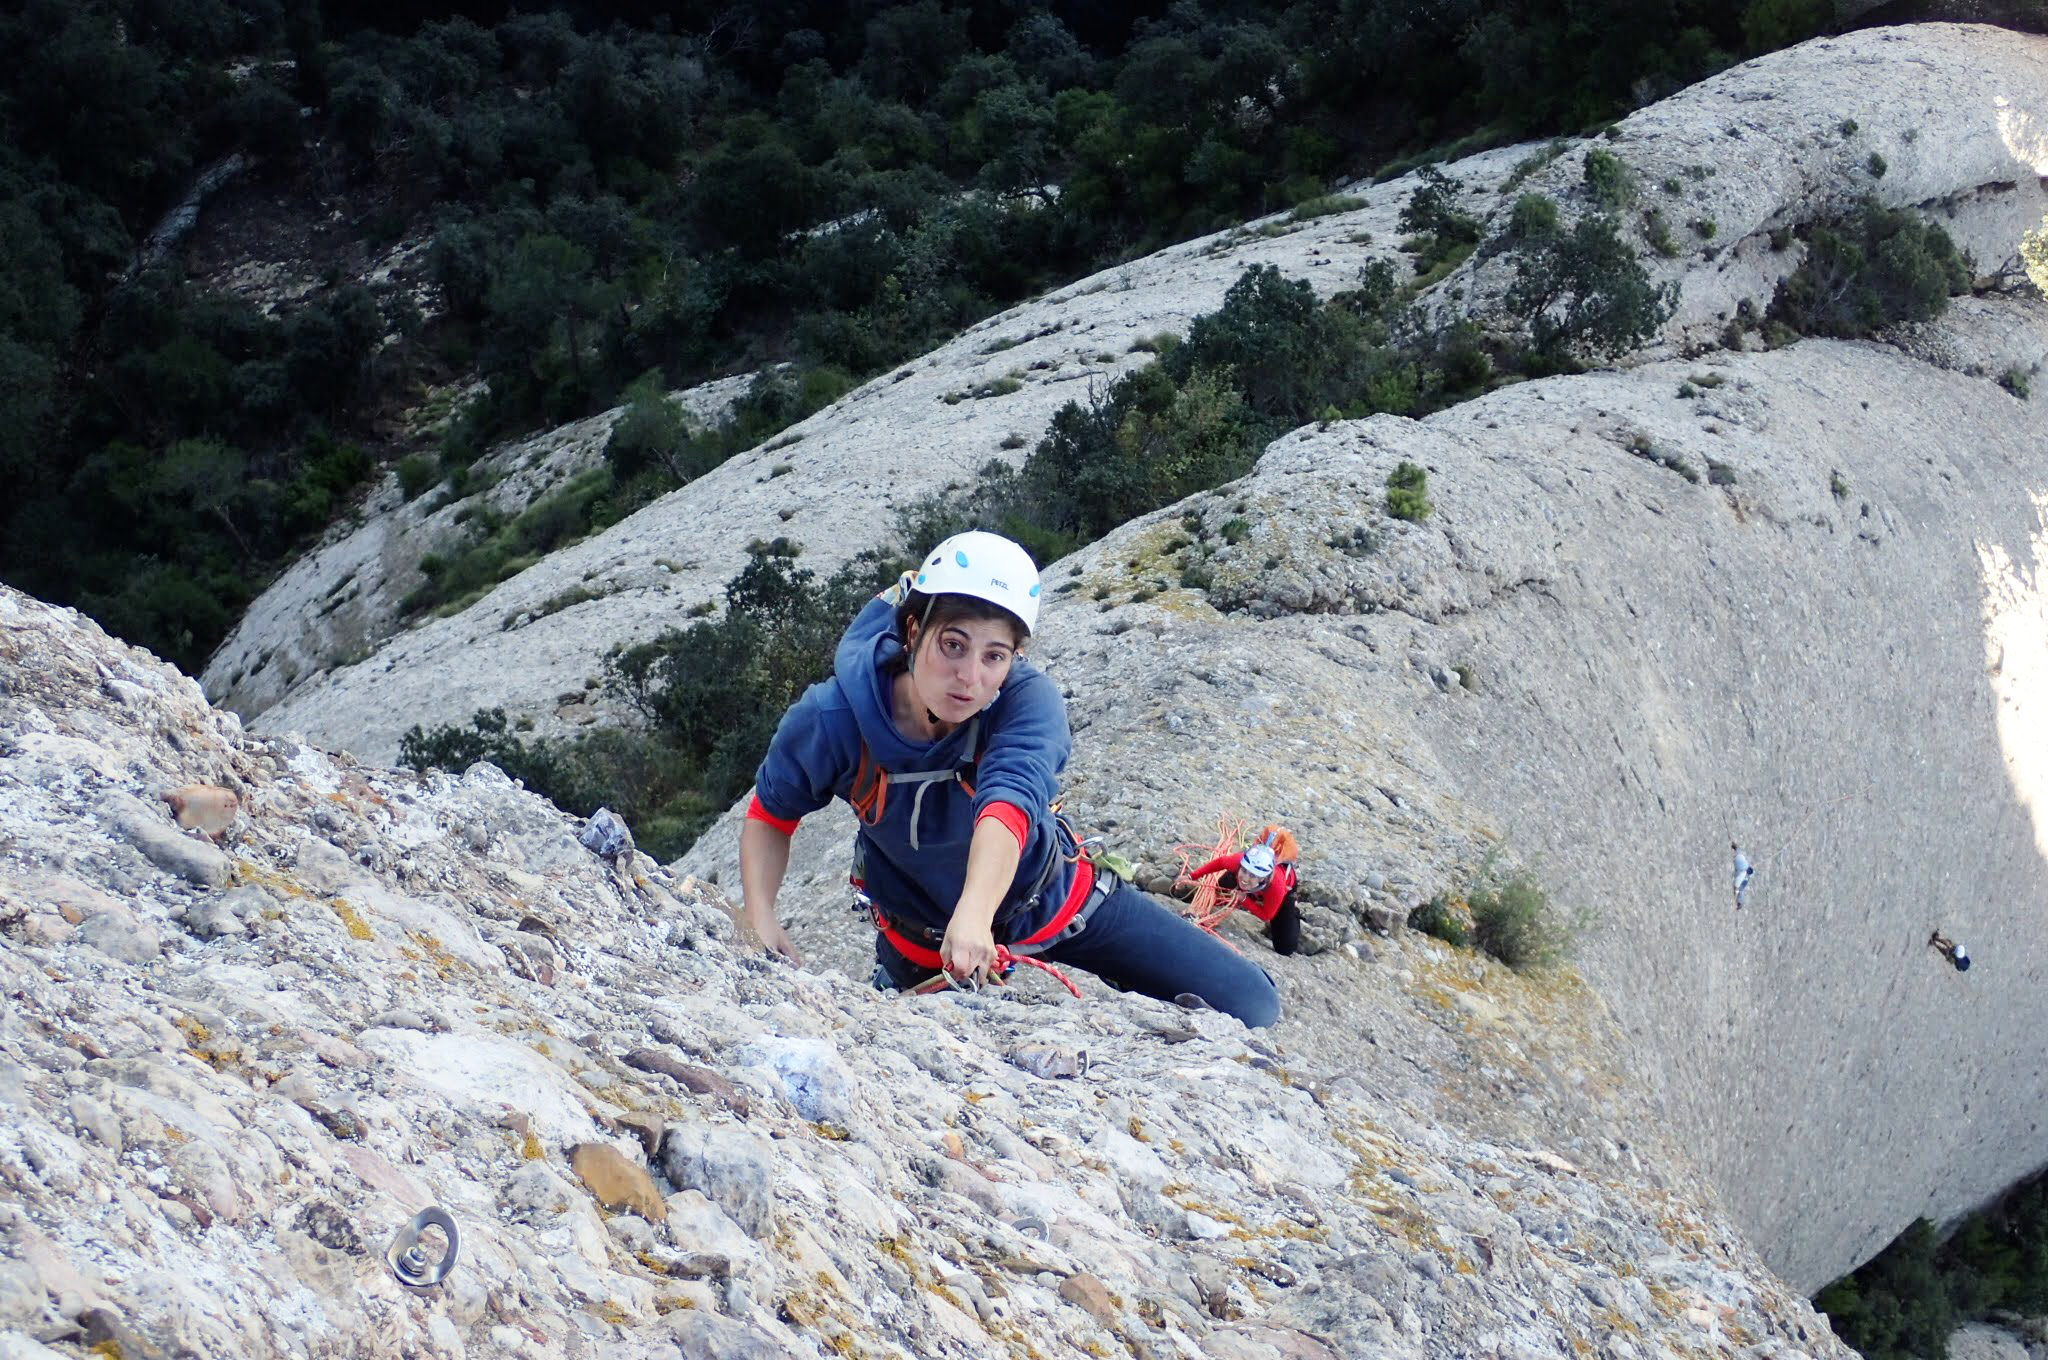 Photography of travel: Punsuola Route to Cavall Bernat. Montserrat, Barcelona